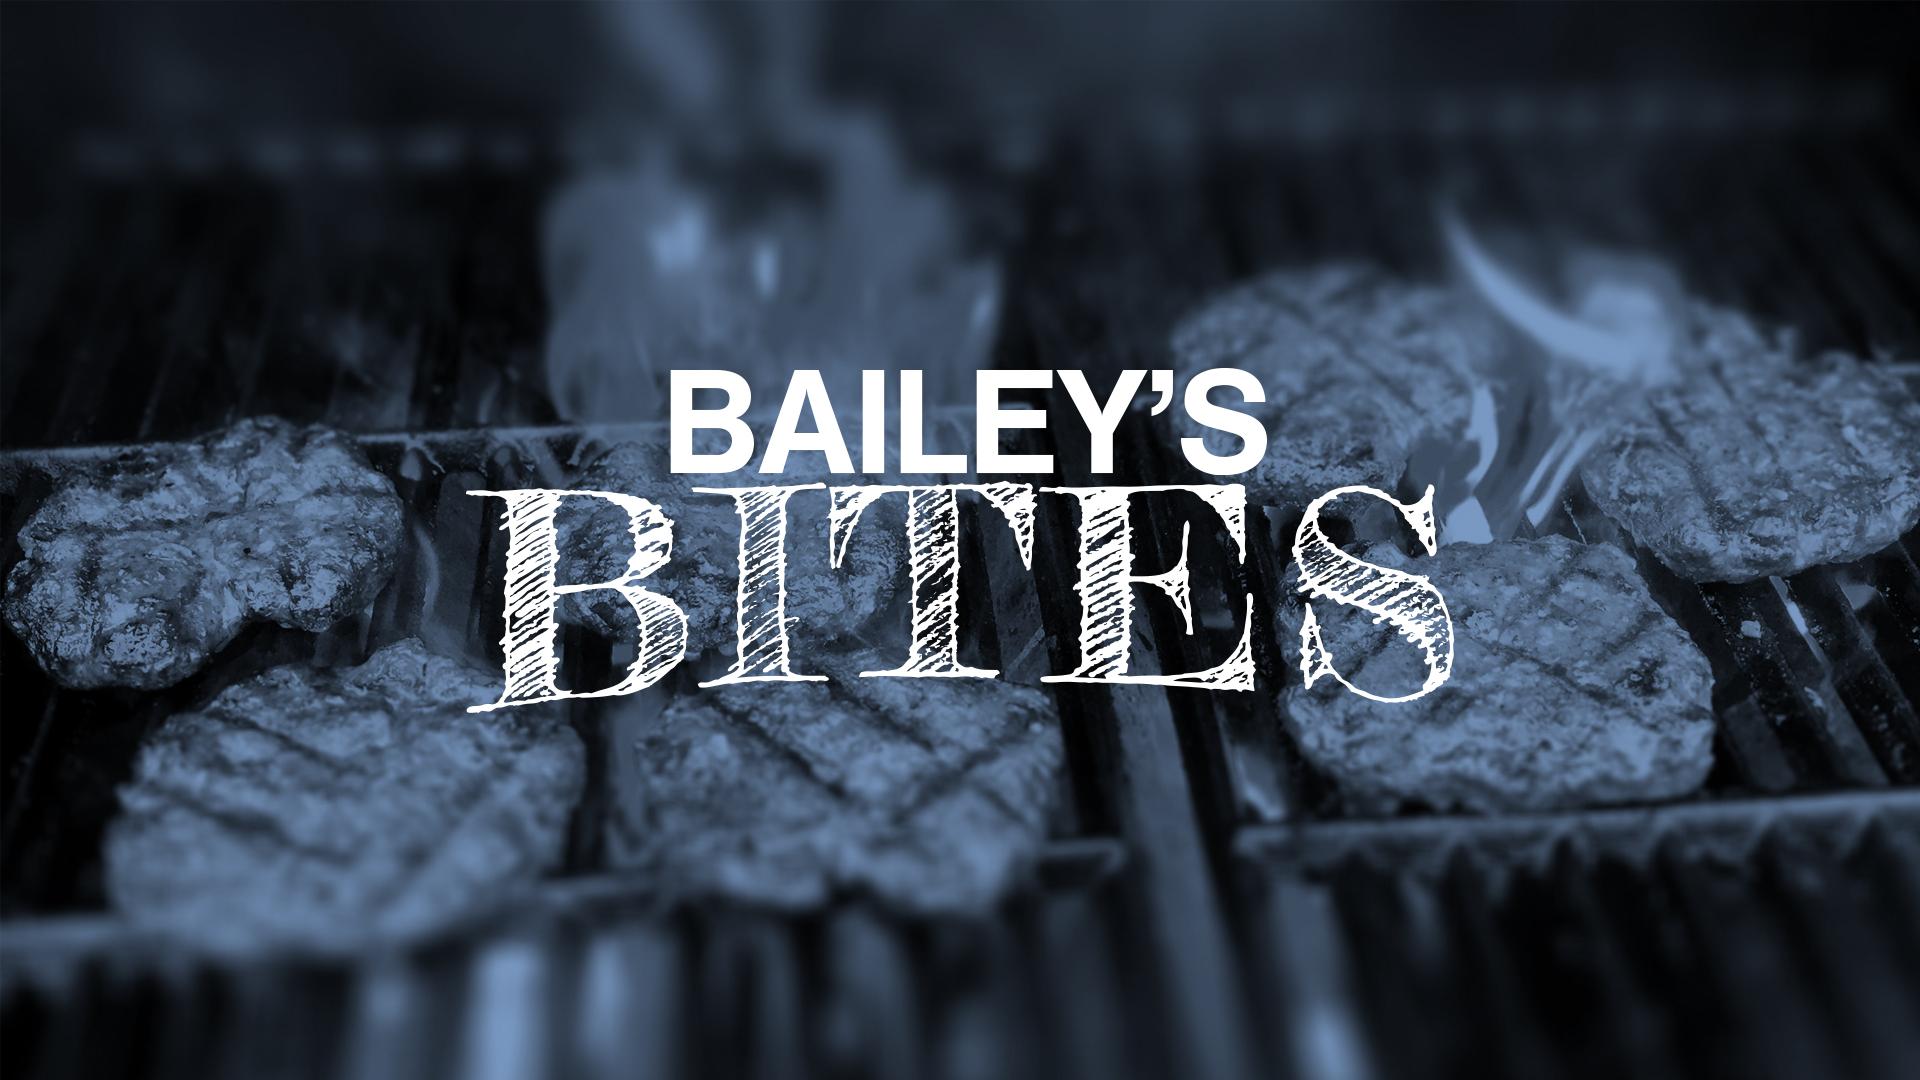 baileys-bites_thumbnail_1521674030931.jpg